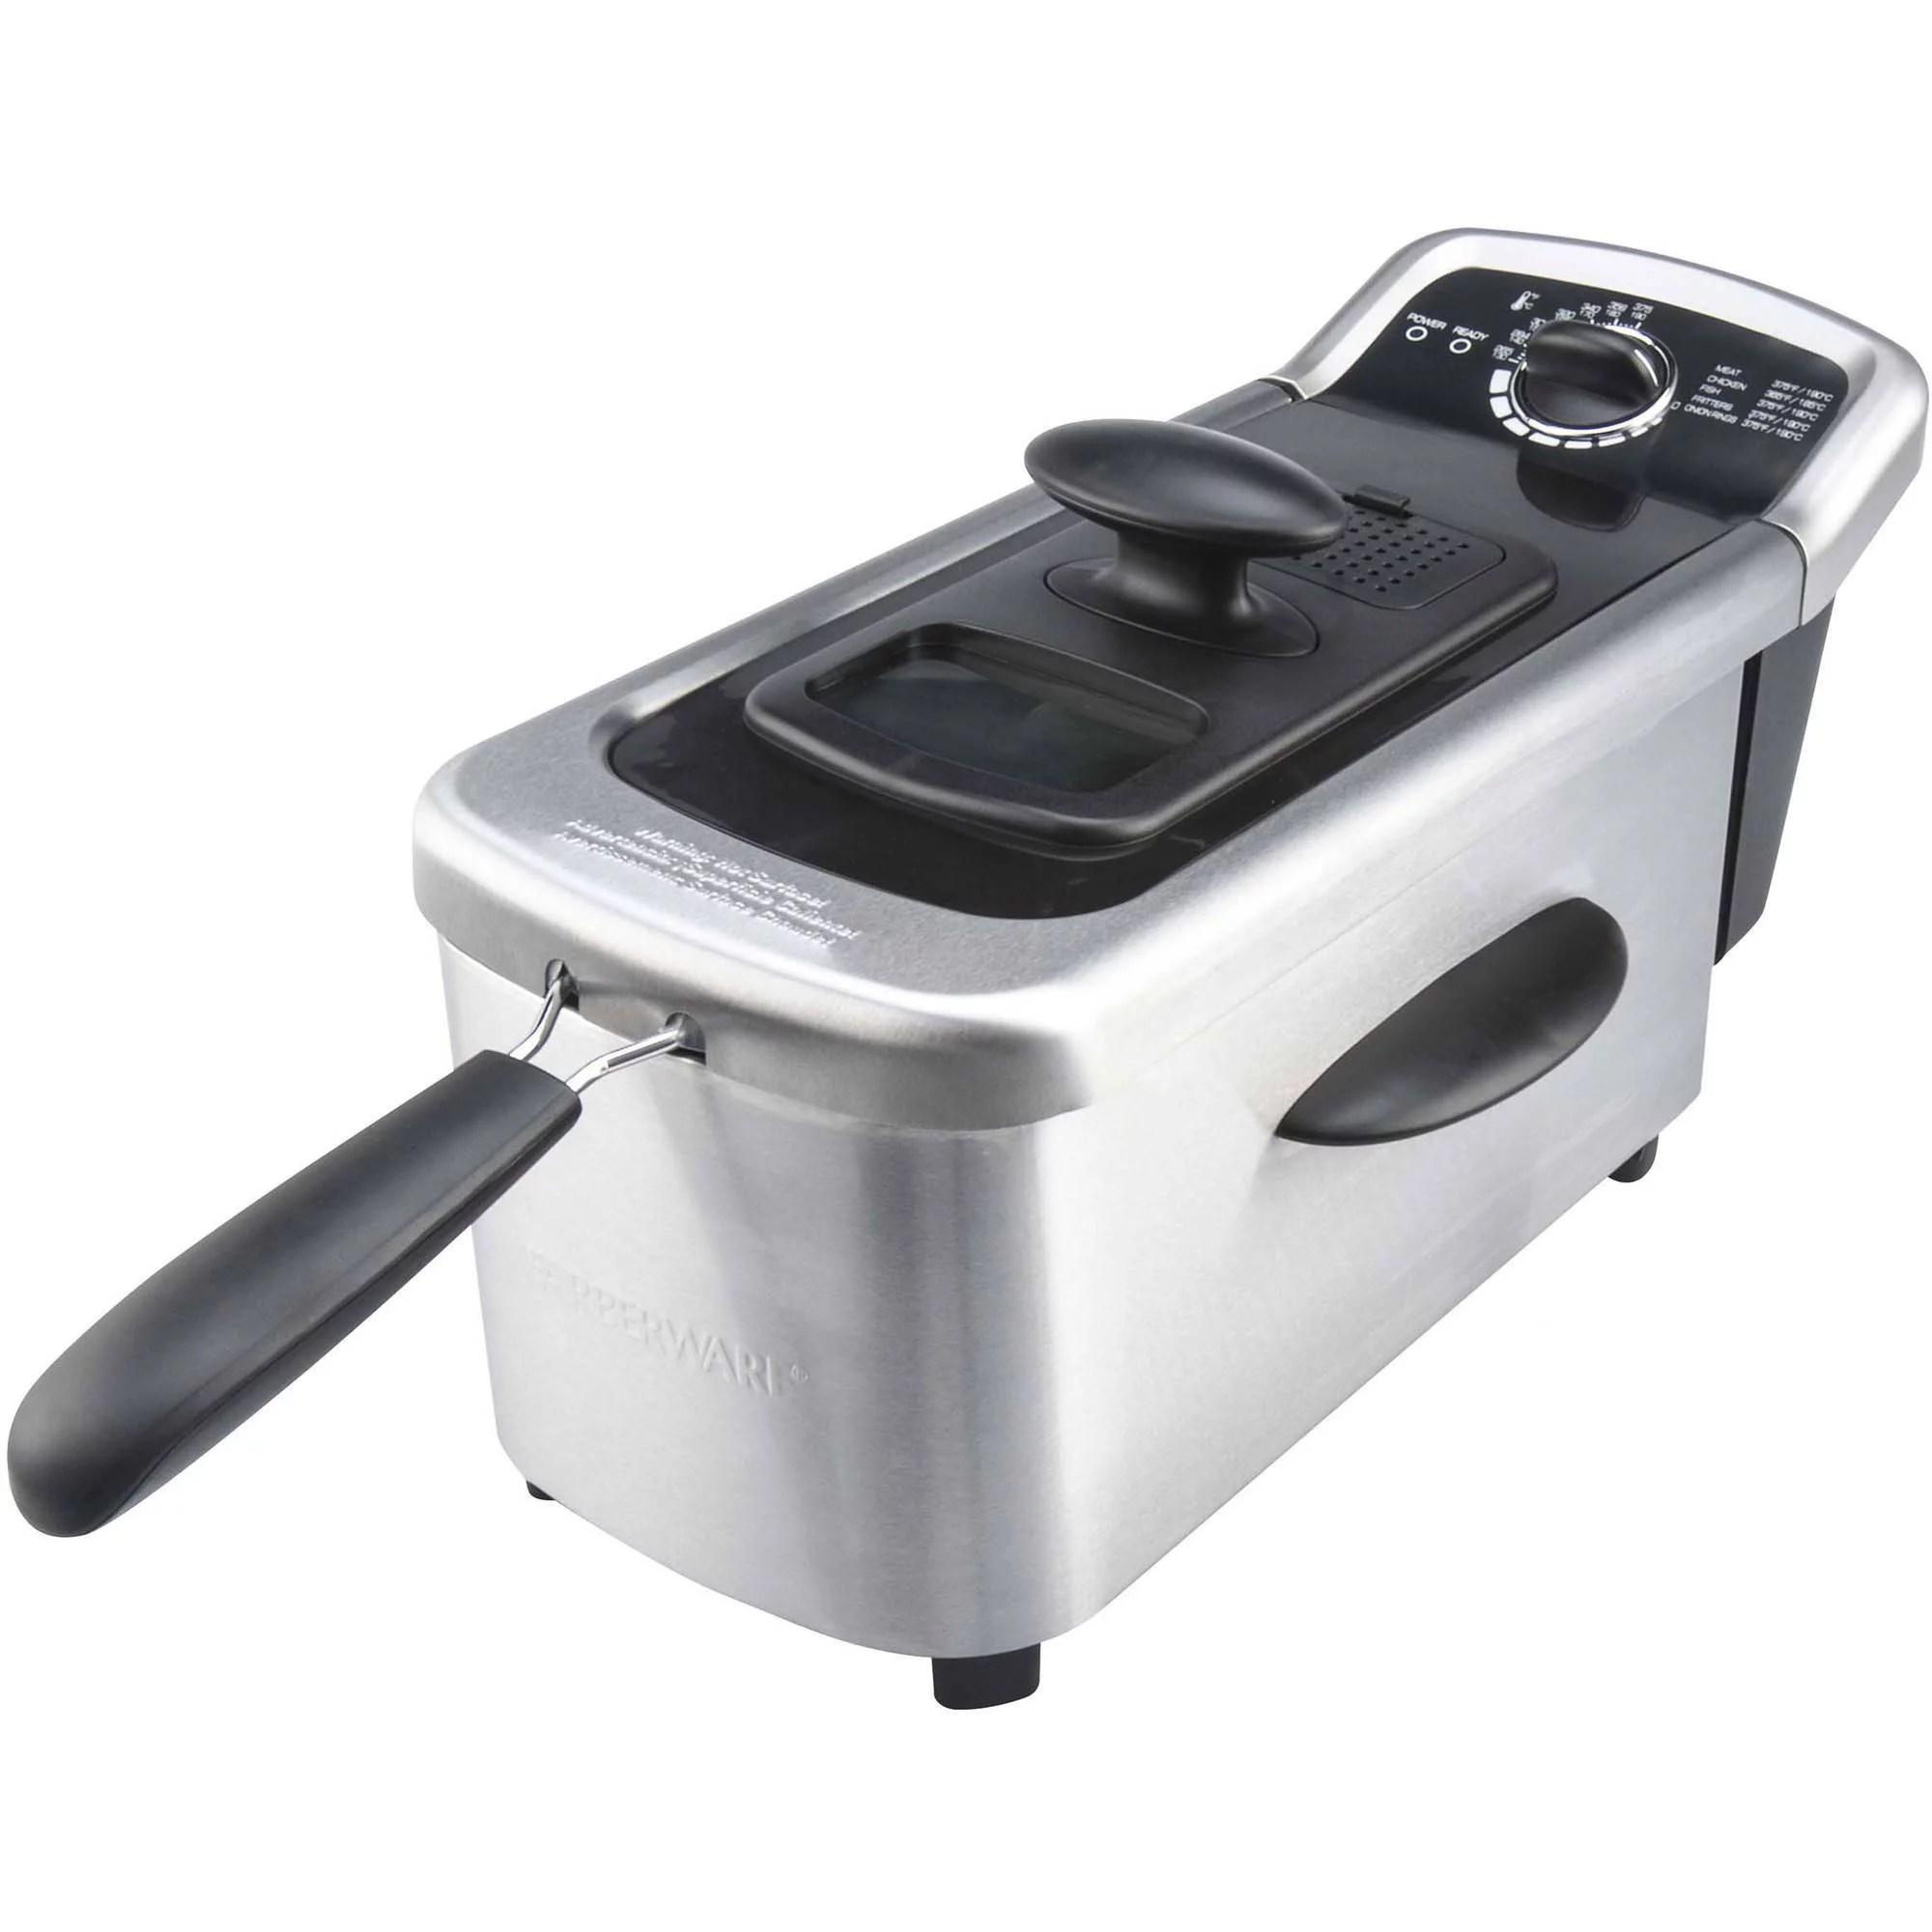 kitchen fryer most popular cabinets presto 05411 granpappy electric deep walmart com